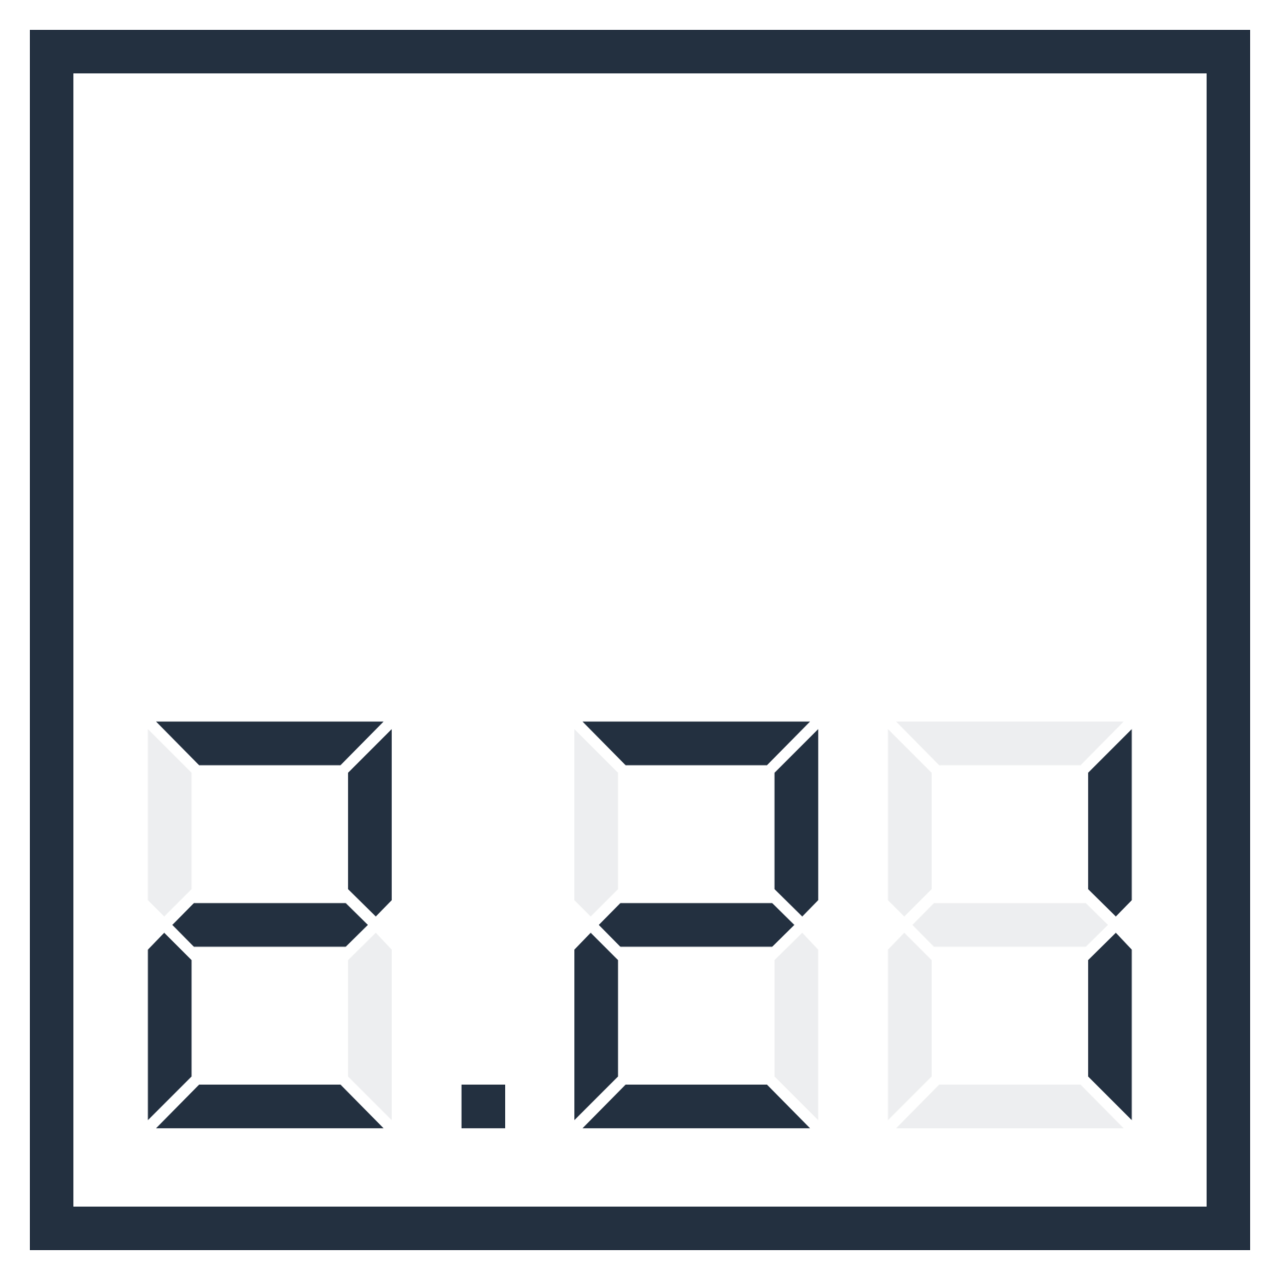 [2.21] Video Game Studio